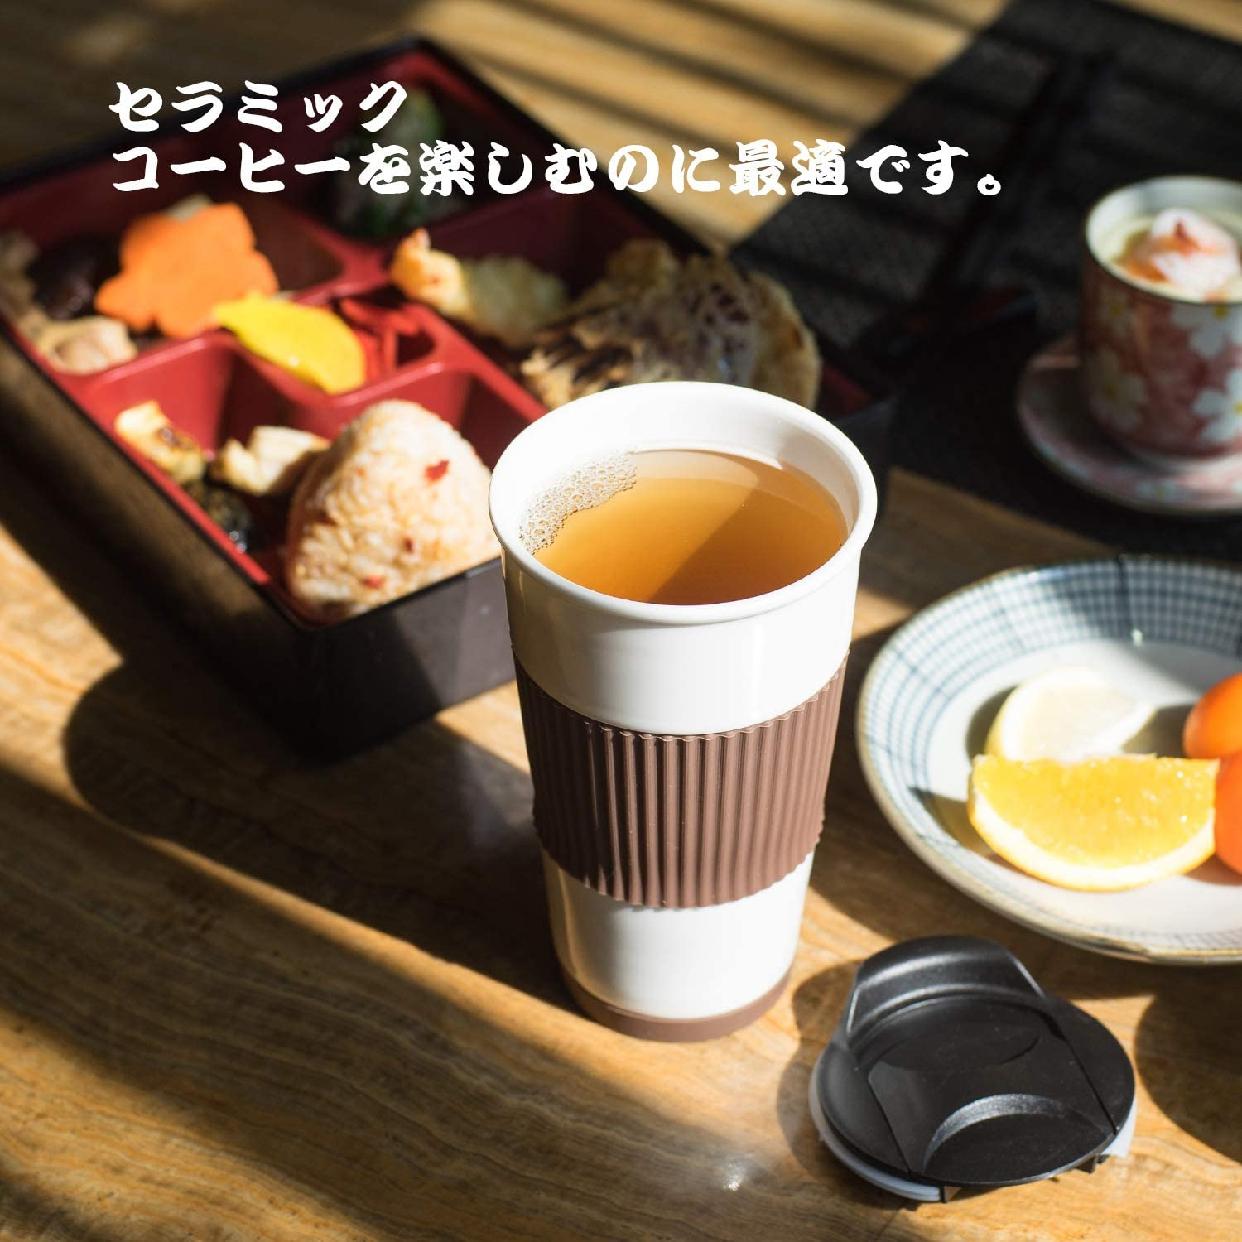 UDMG(ユーディーエムジー) 二重構造断熱コーヒーカップの商品画像4